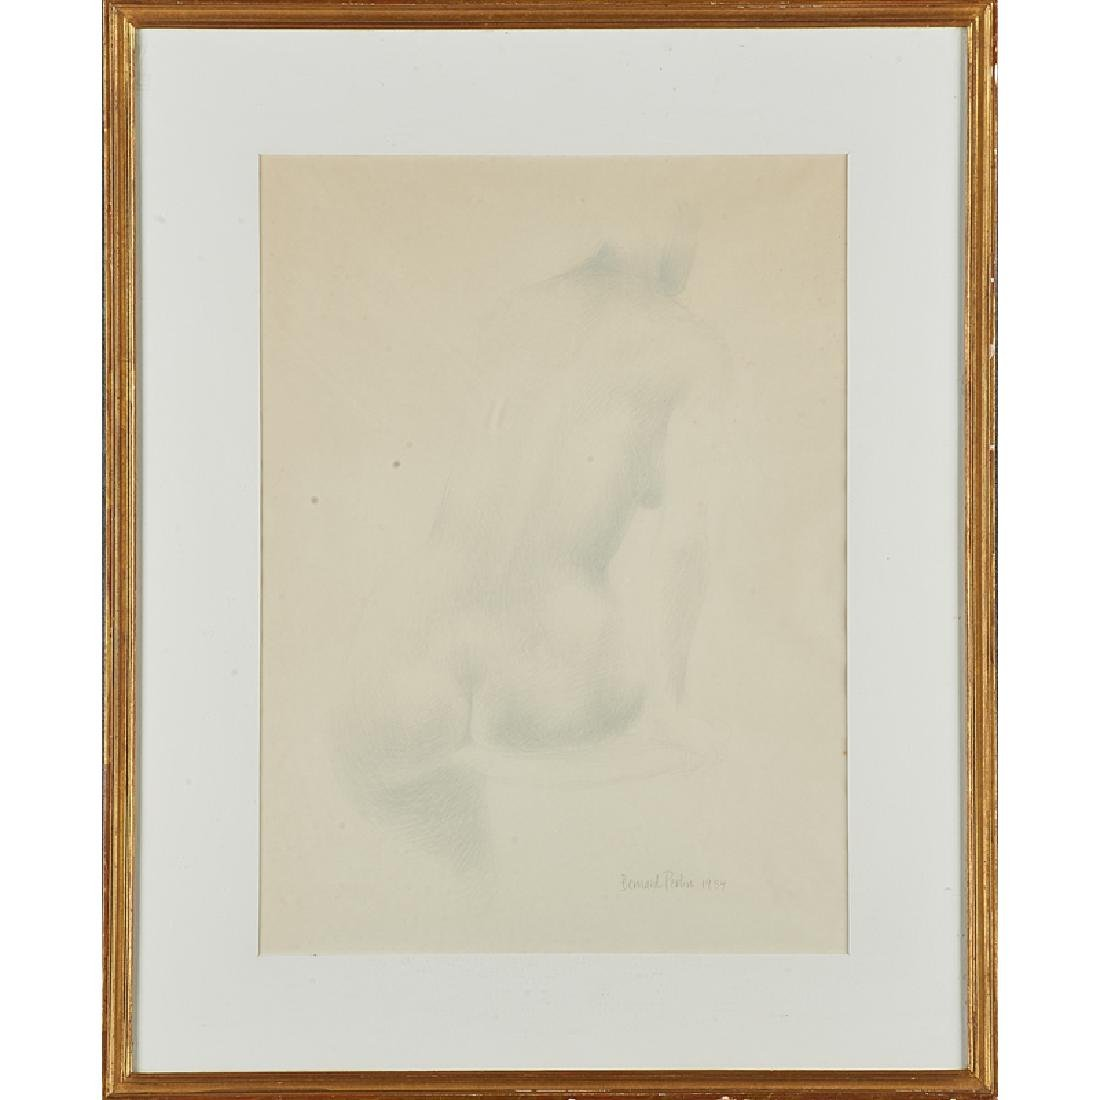 BERNARD PERLIN (American, 1918-2014)